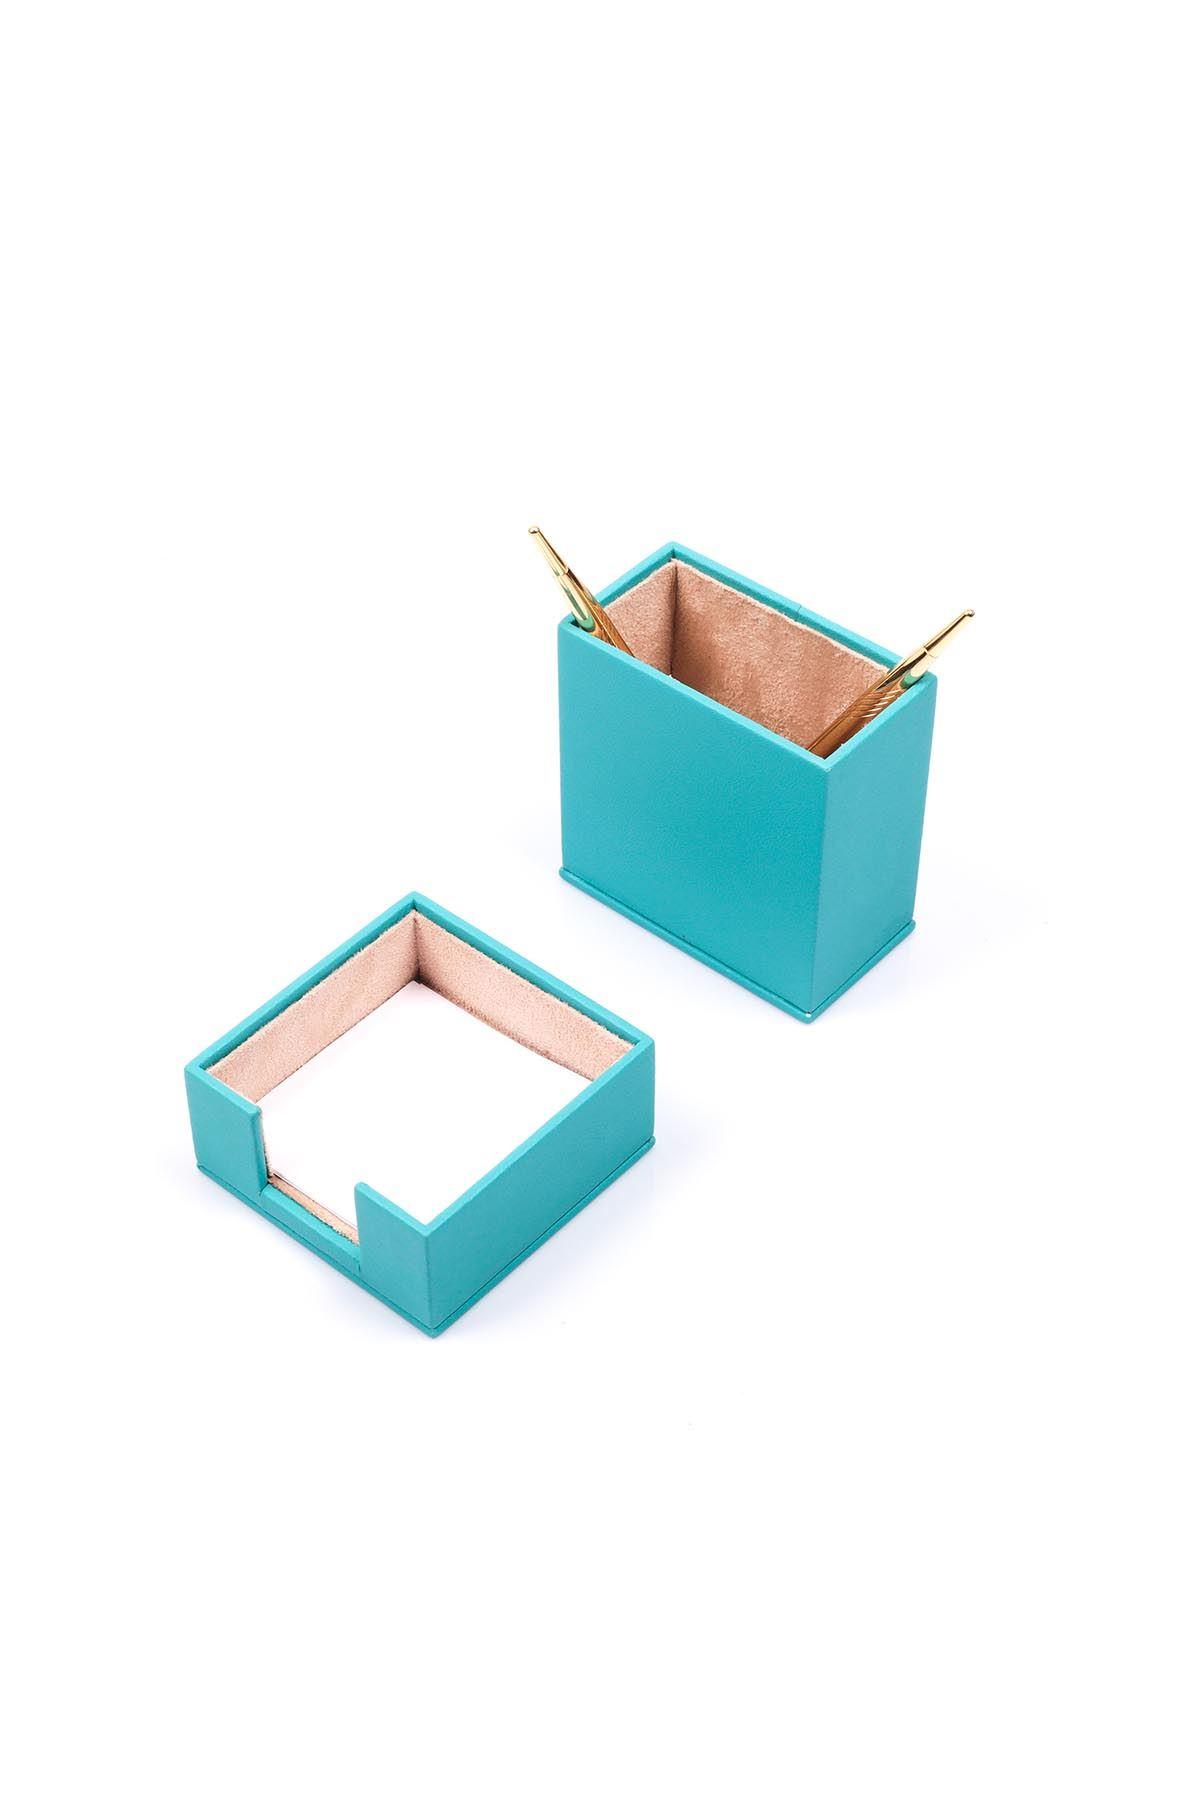 Leather Desk Accessories set of 2 Turquise| Desk Set Accessories | Desktop Accessories | Desk Accessories | Desk Organizers | Pencil Holder | Note Paper Holder